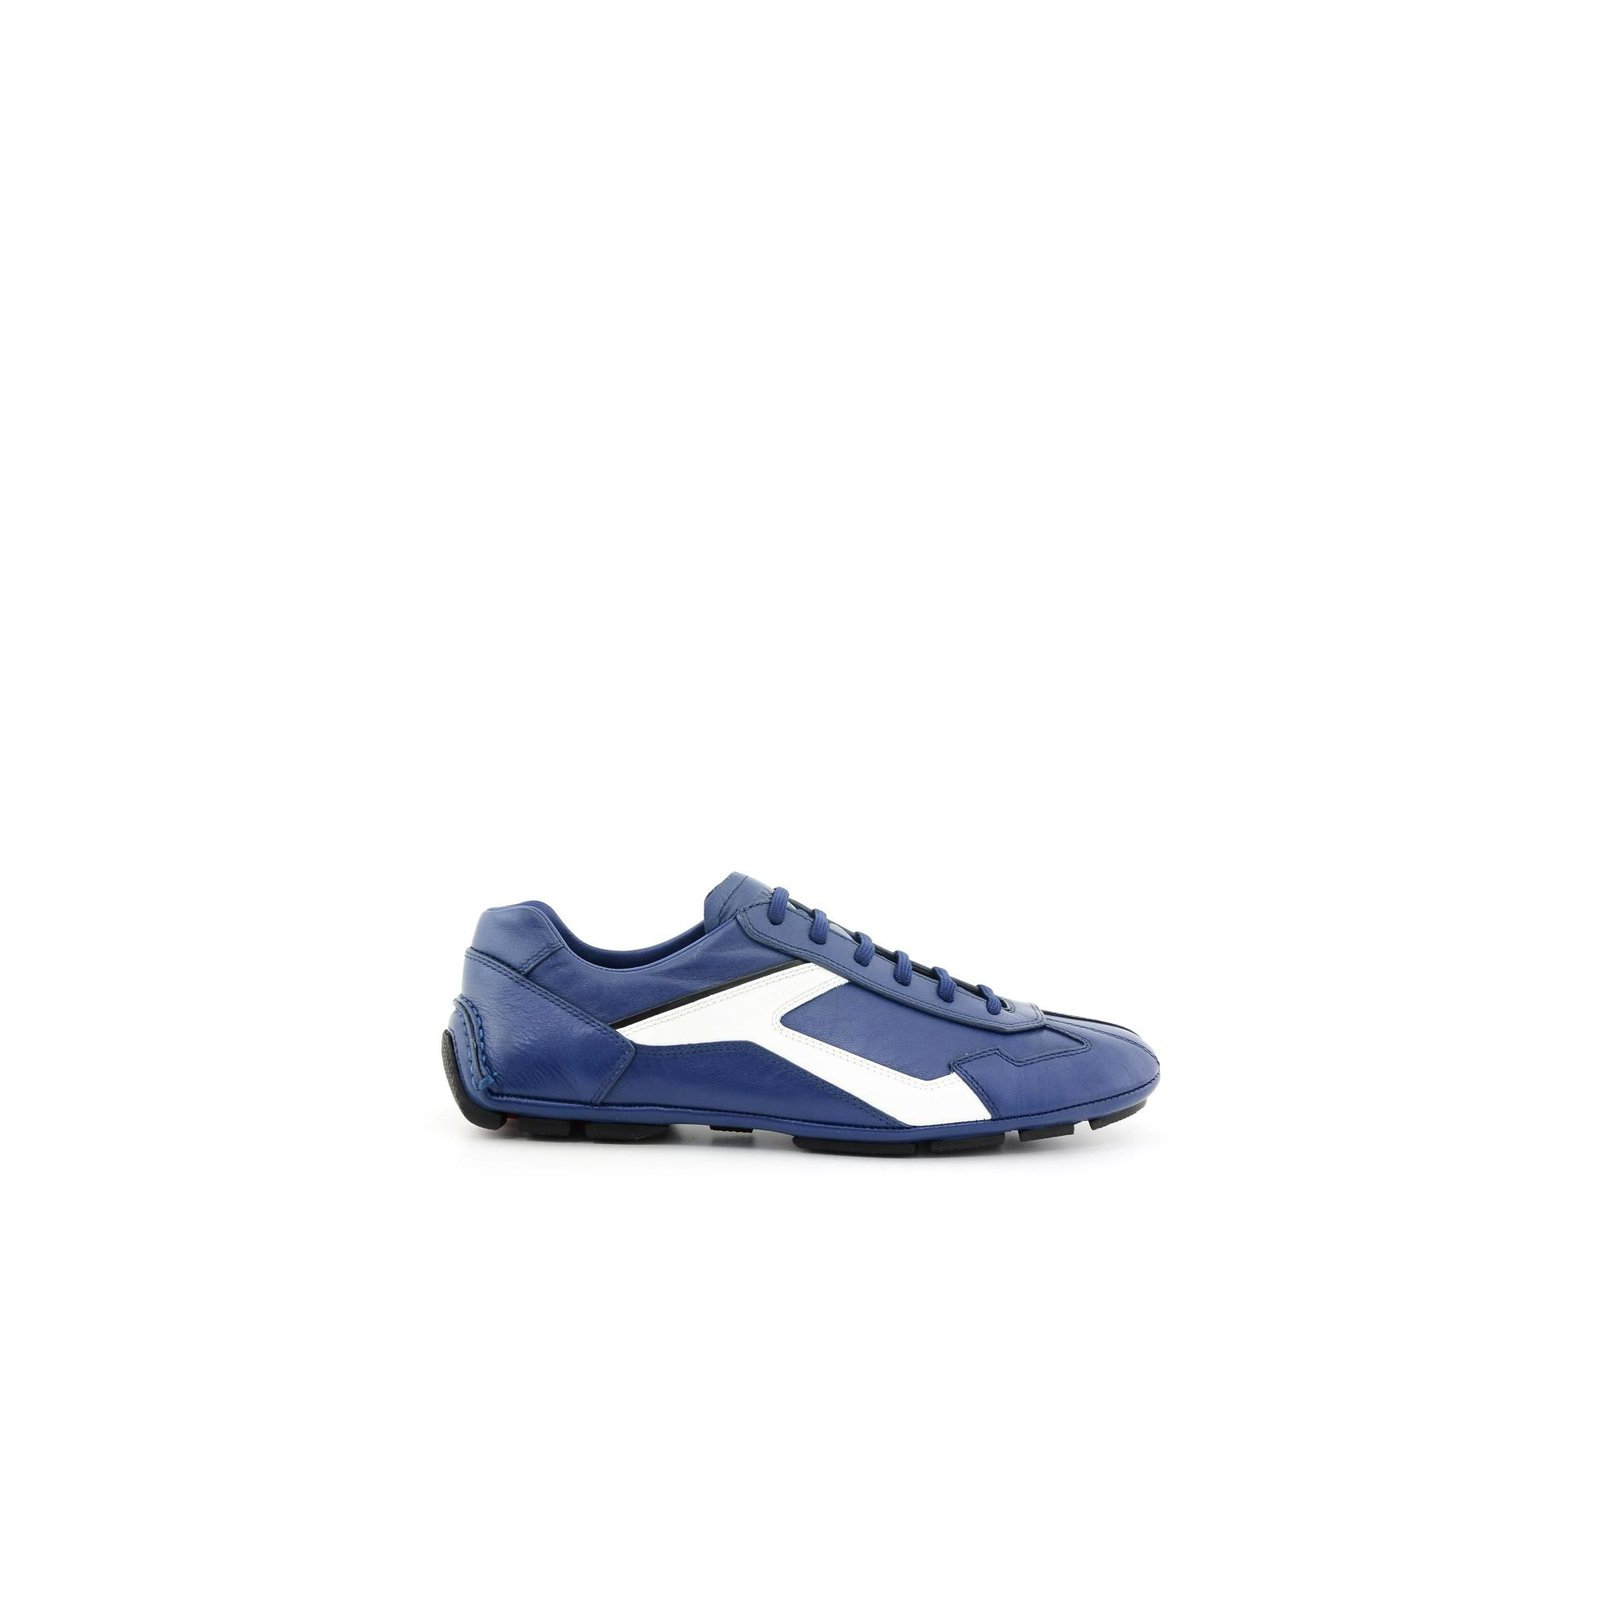 Cuir Joli Homme 63565 Bleu Ref Baskets Prada Closet qxEYga8w